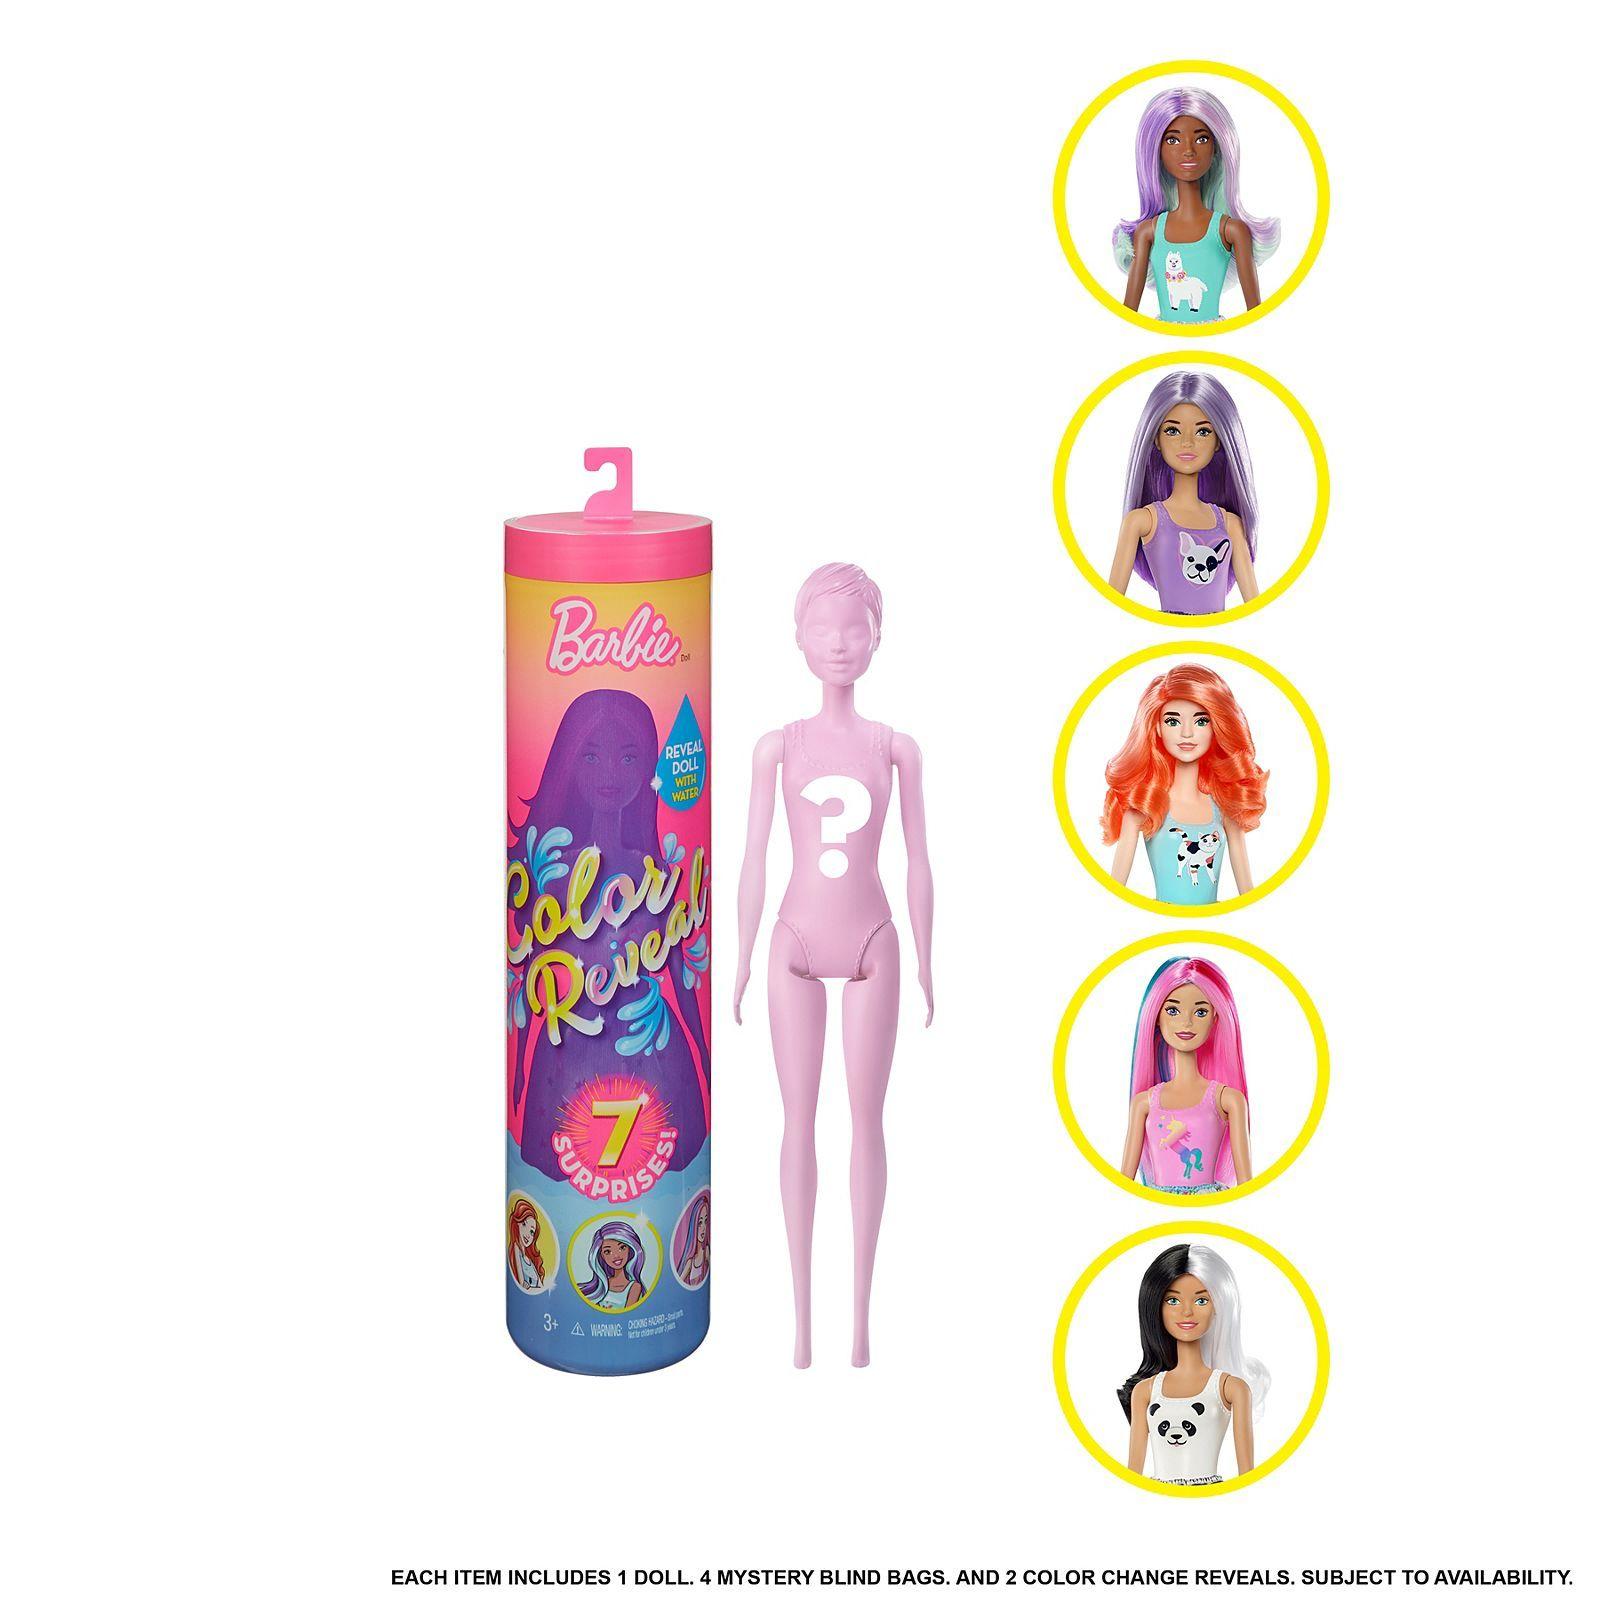 Toys R Us Barbie Reveal